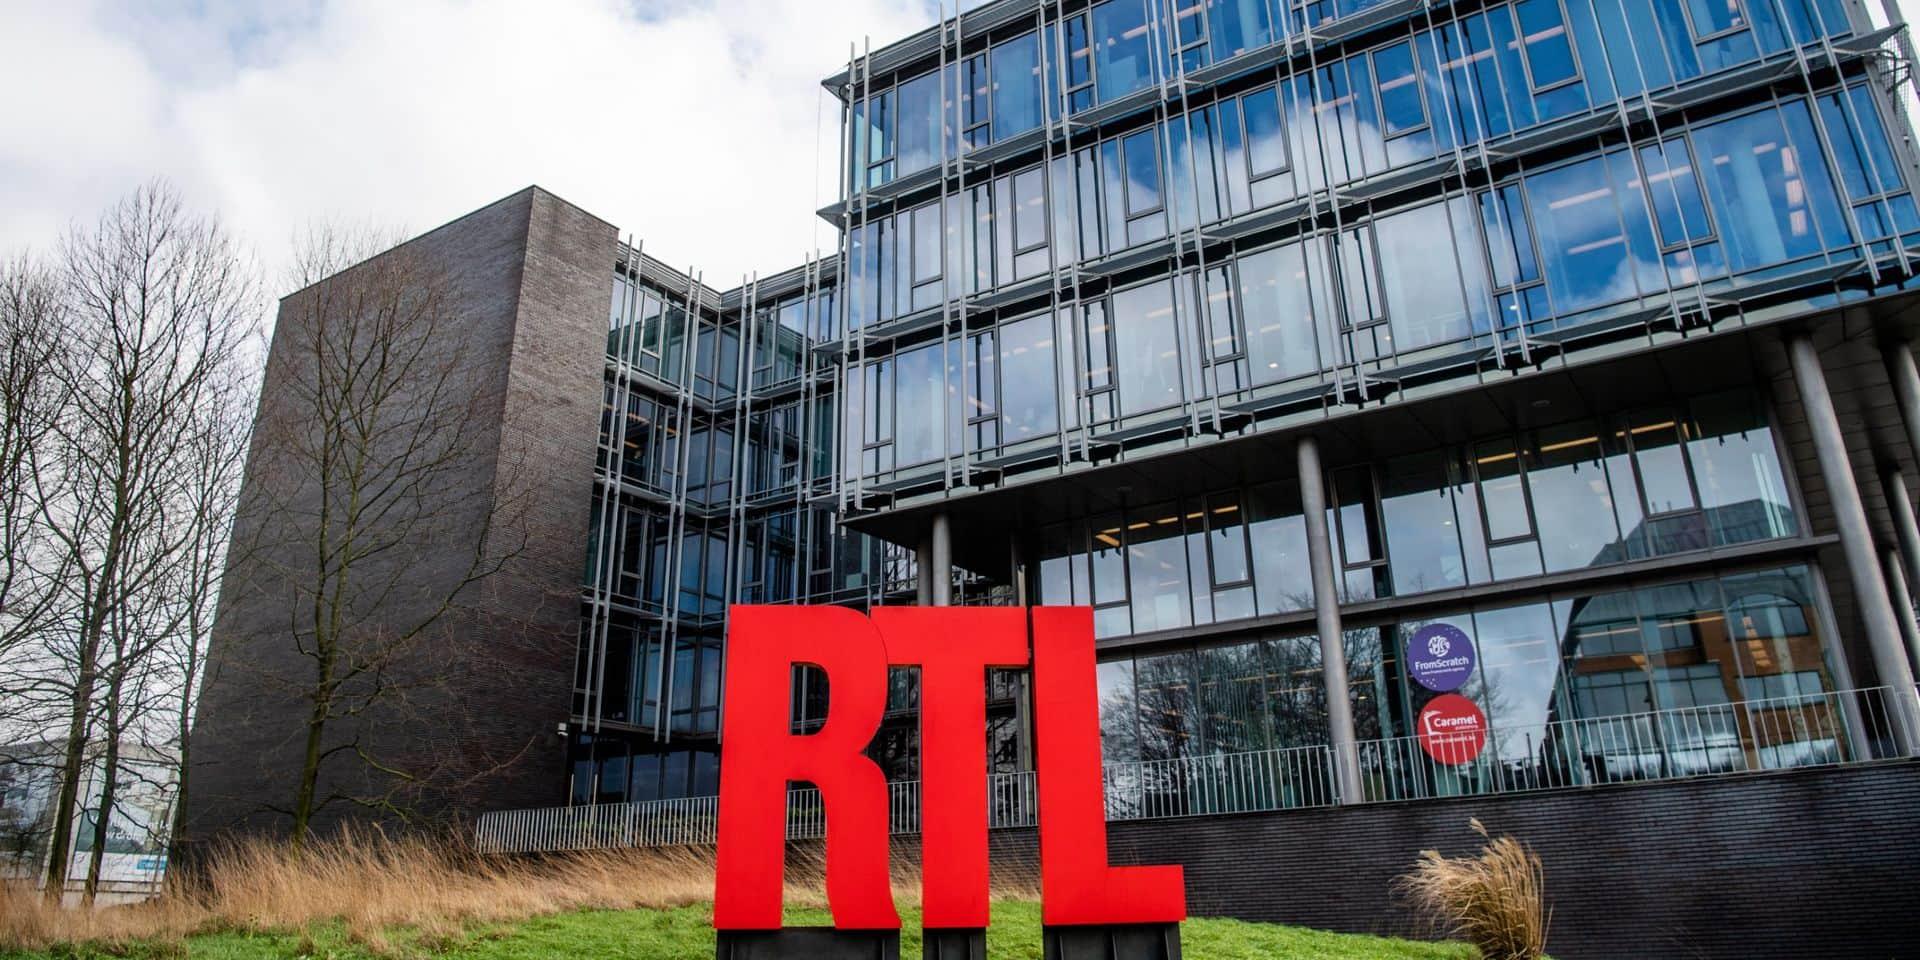 RTL Belgique mis en vente, quid de son avenir? Voici les scénarios sur la table